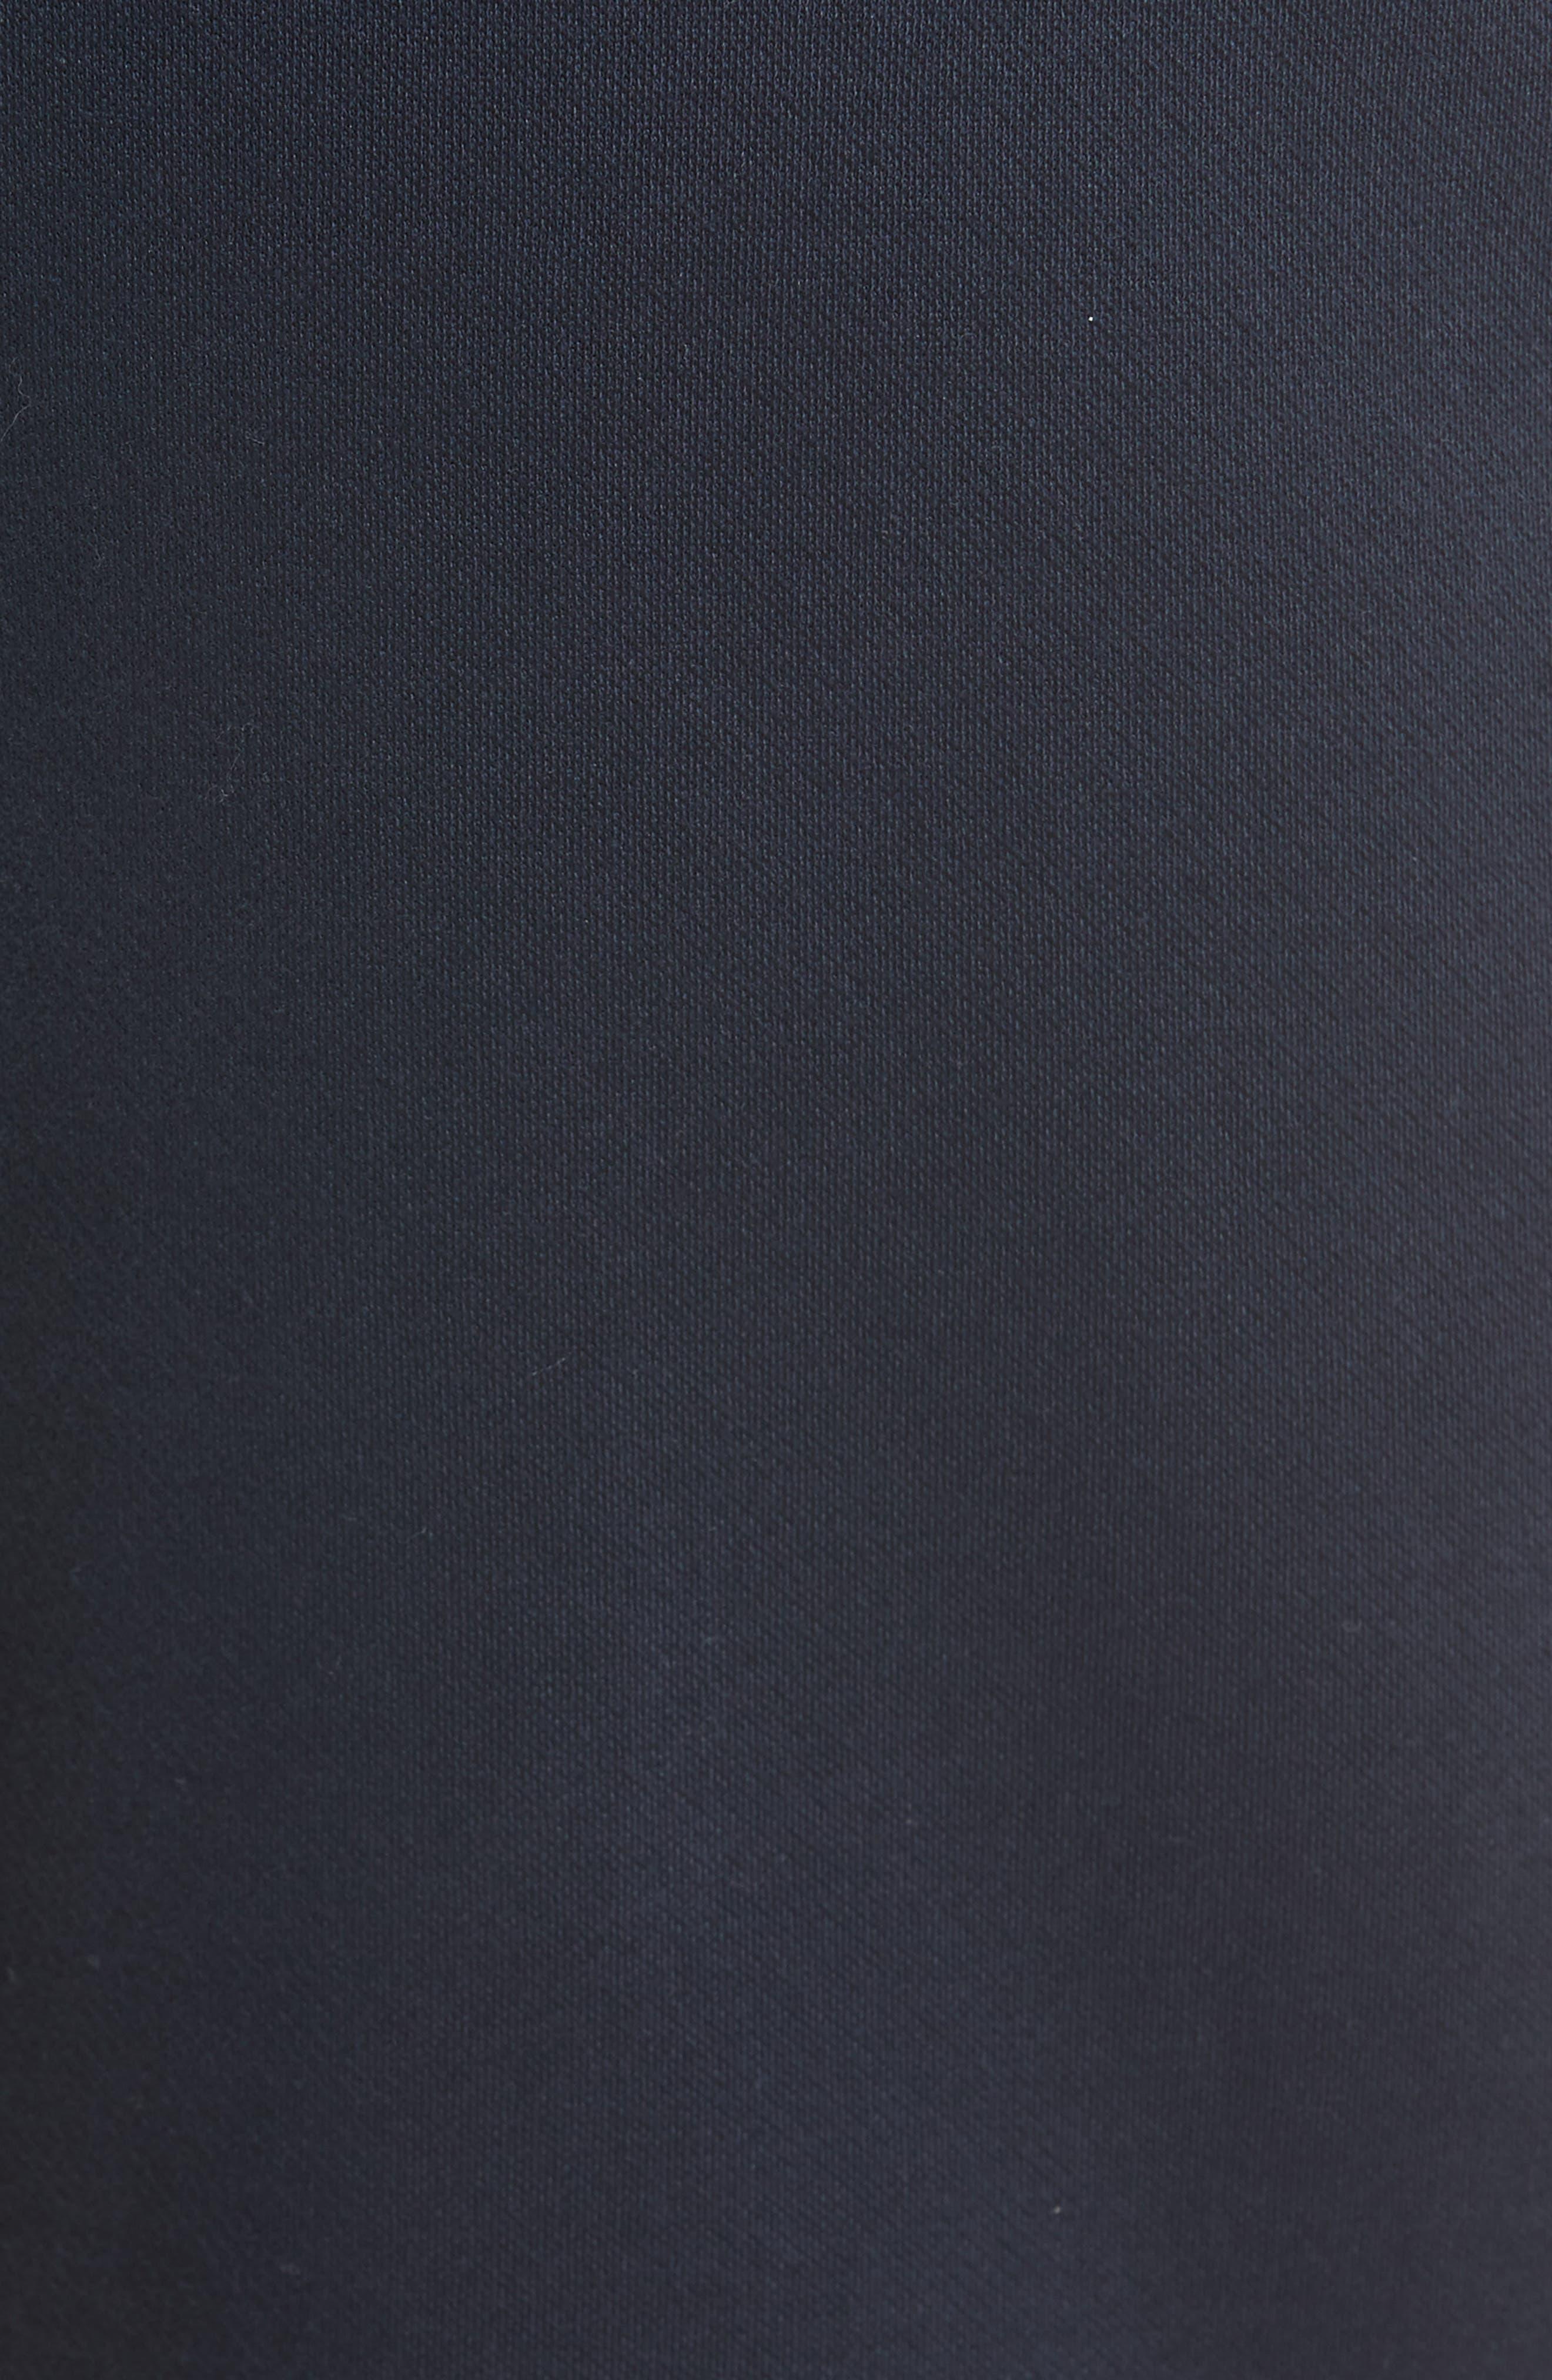 Double Knit Jogger Pants,                             Alternate thumbnail 2, color,                             410